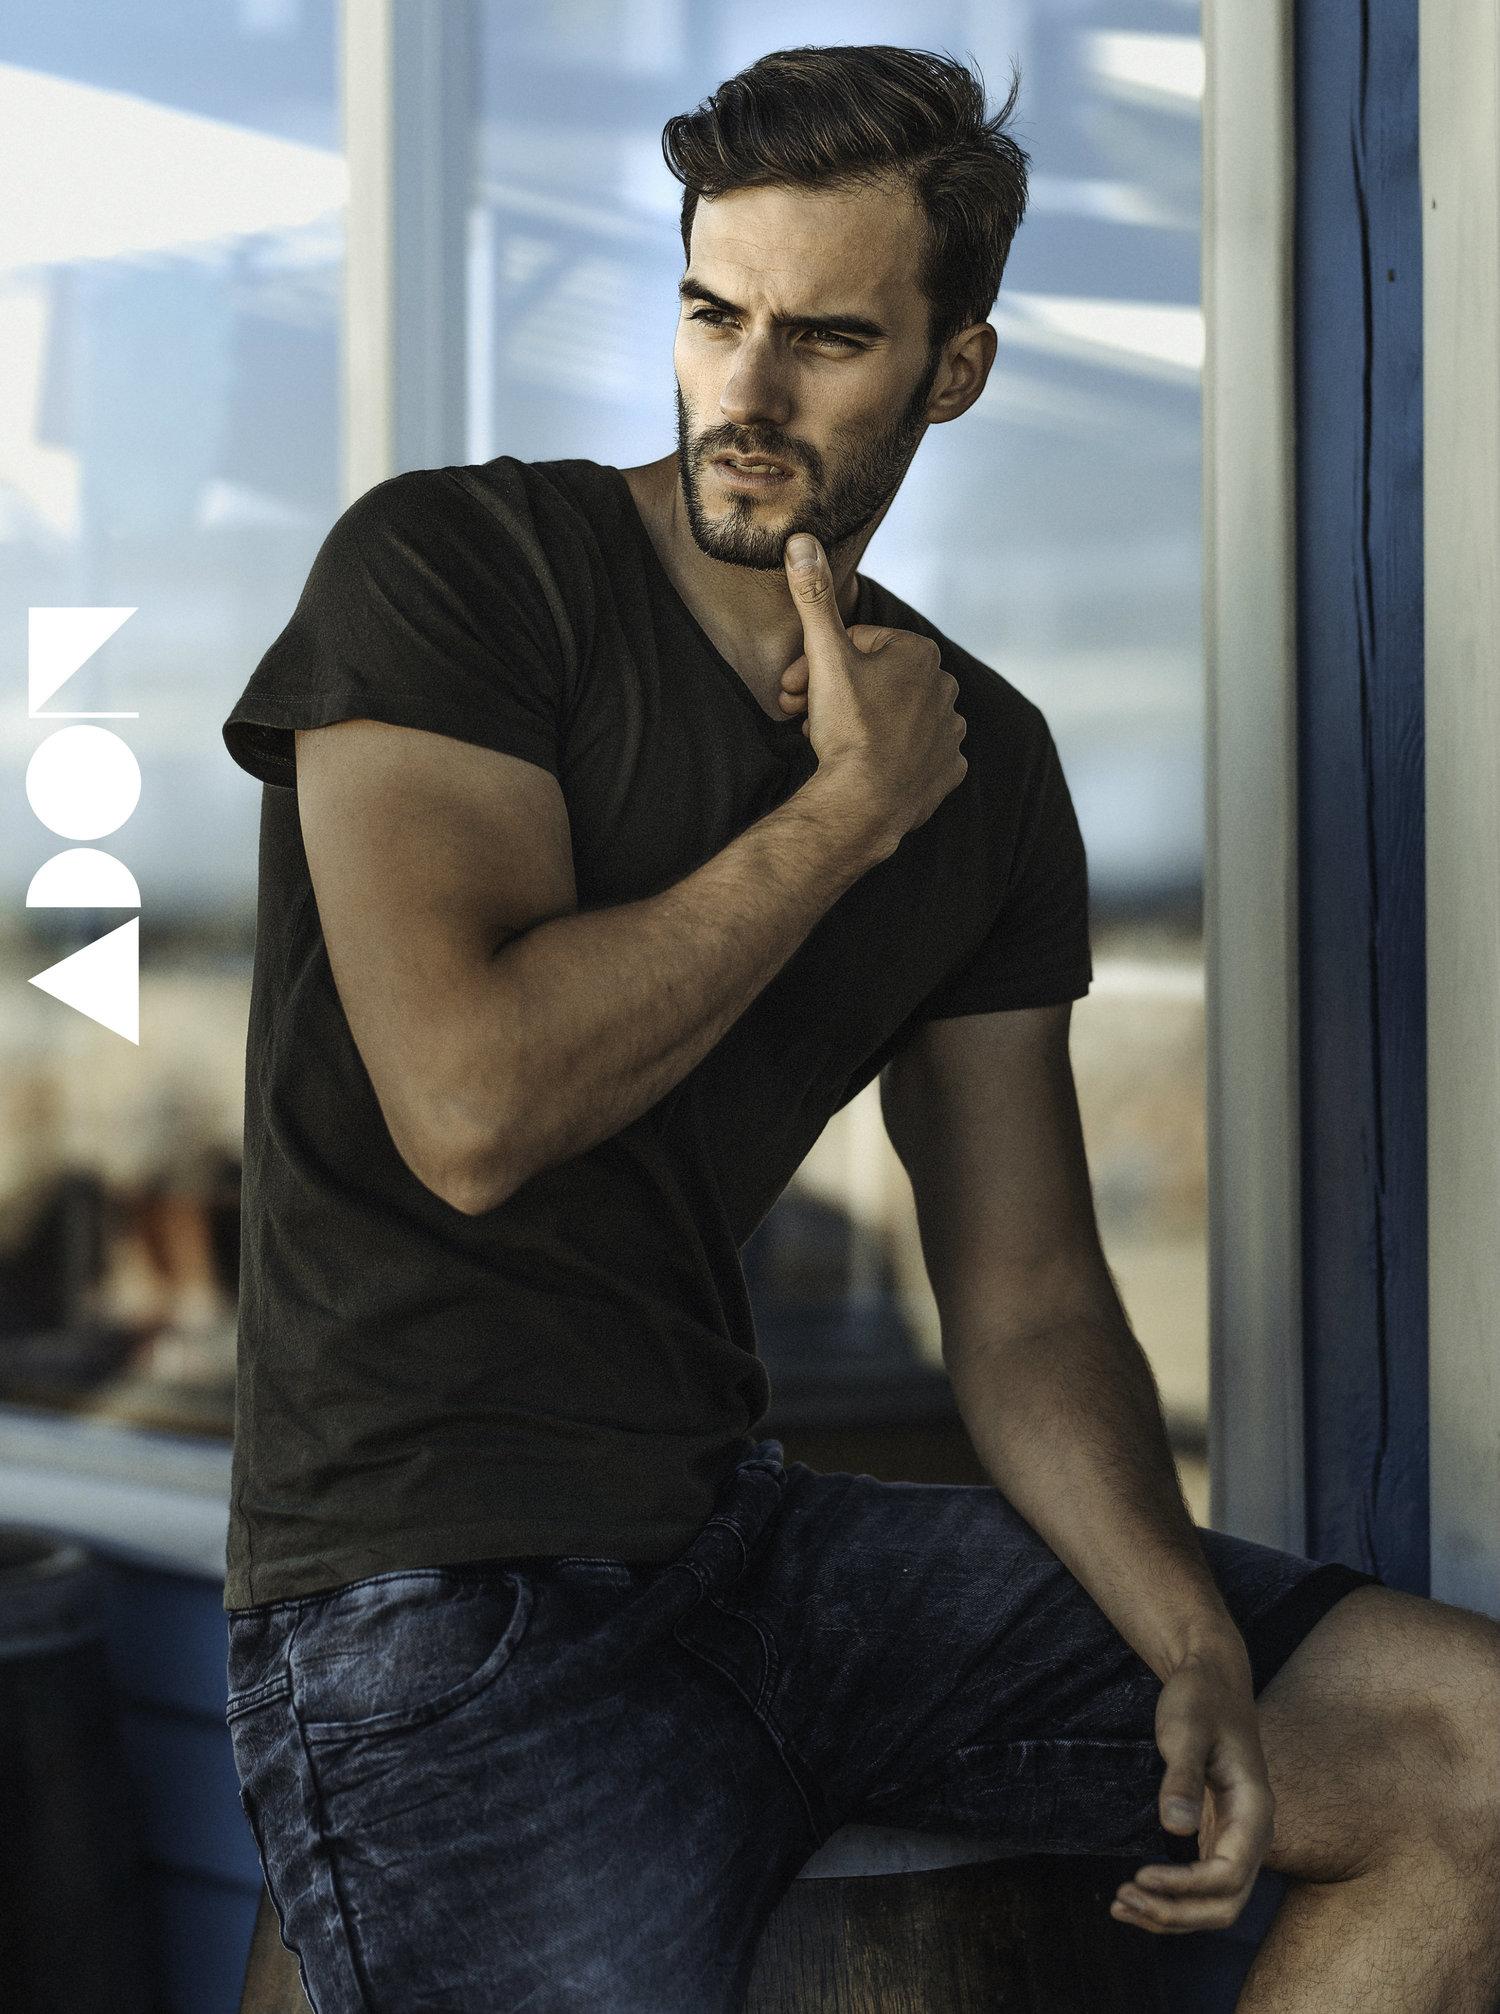 Adon Exclusive: Model Filip Siuchtainsta By Bartosz Szwaja